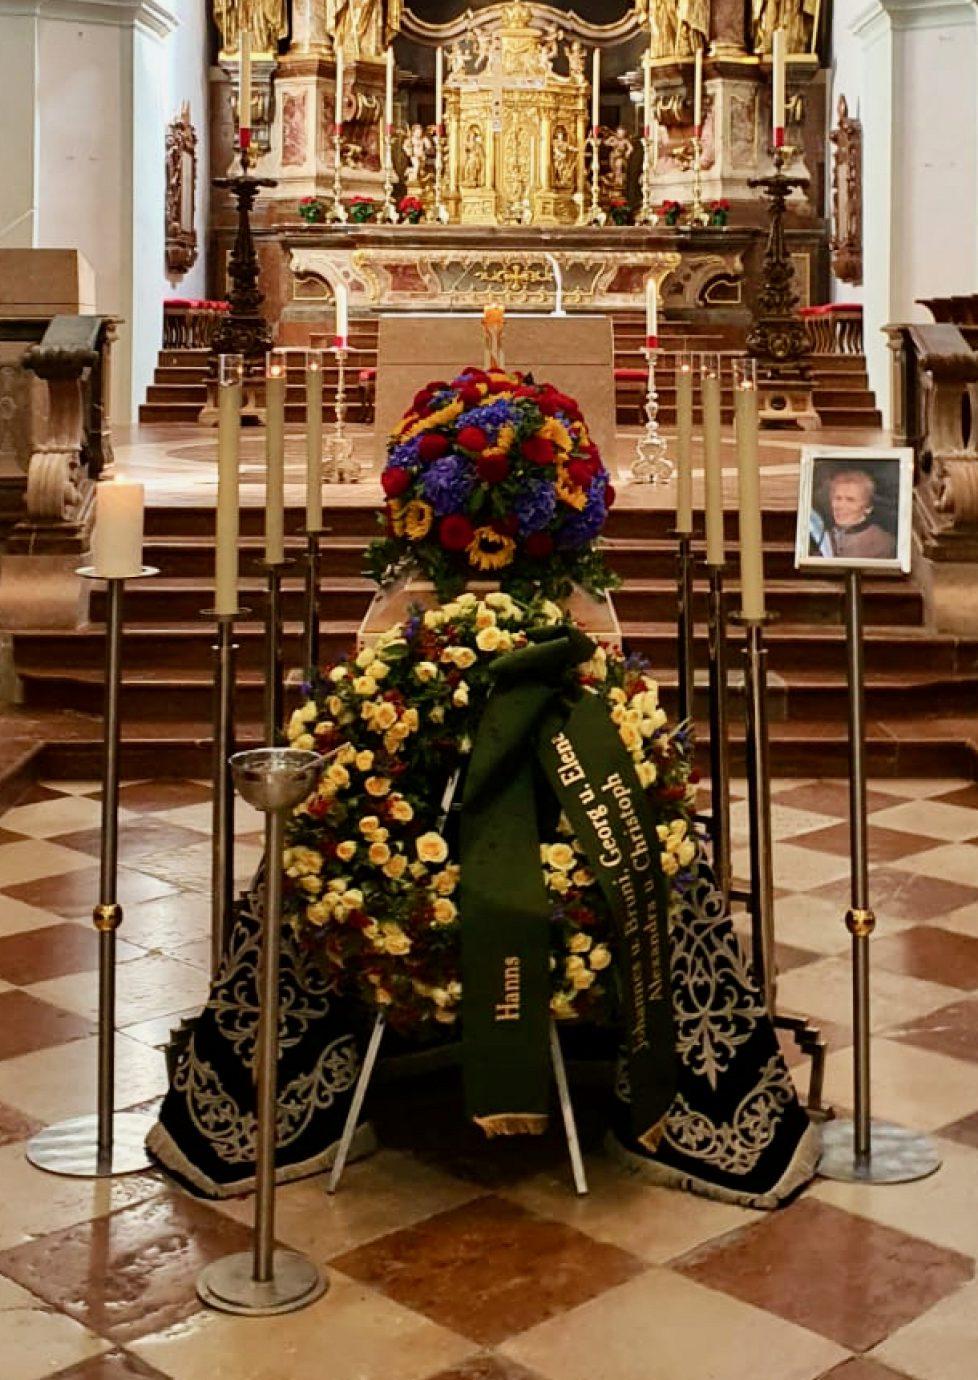 202199-Salzburg-Abatia-Sfantul-Petru-inmormantarea-Arhiducesei-Maria-Magdalena-7